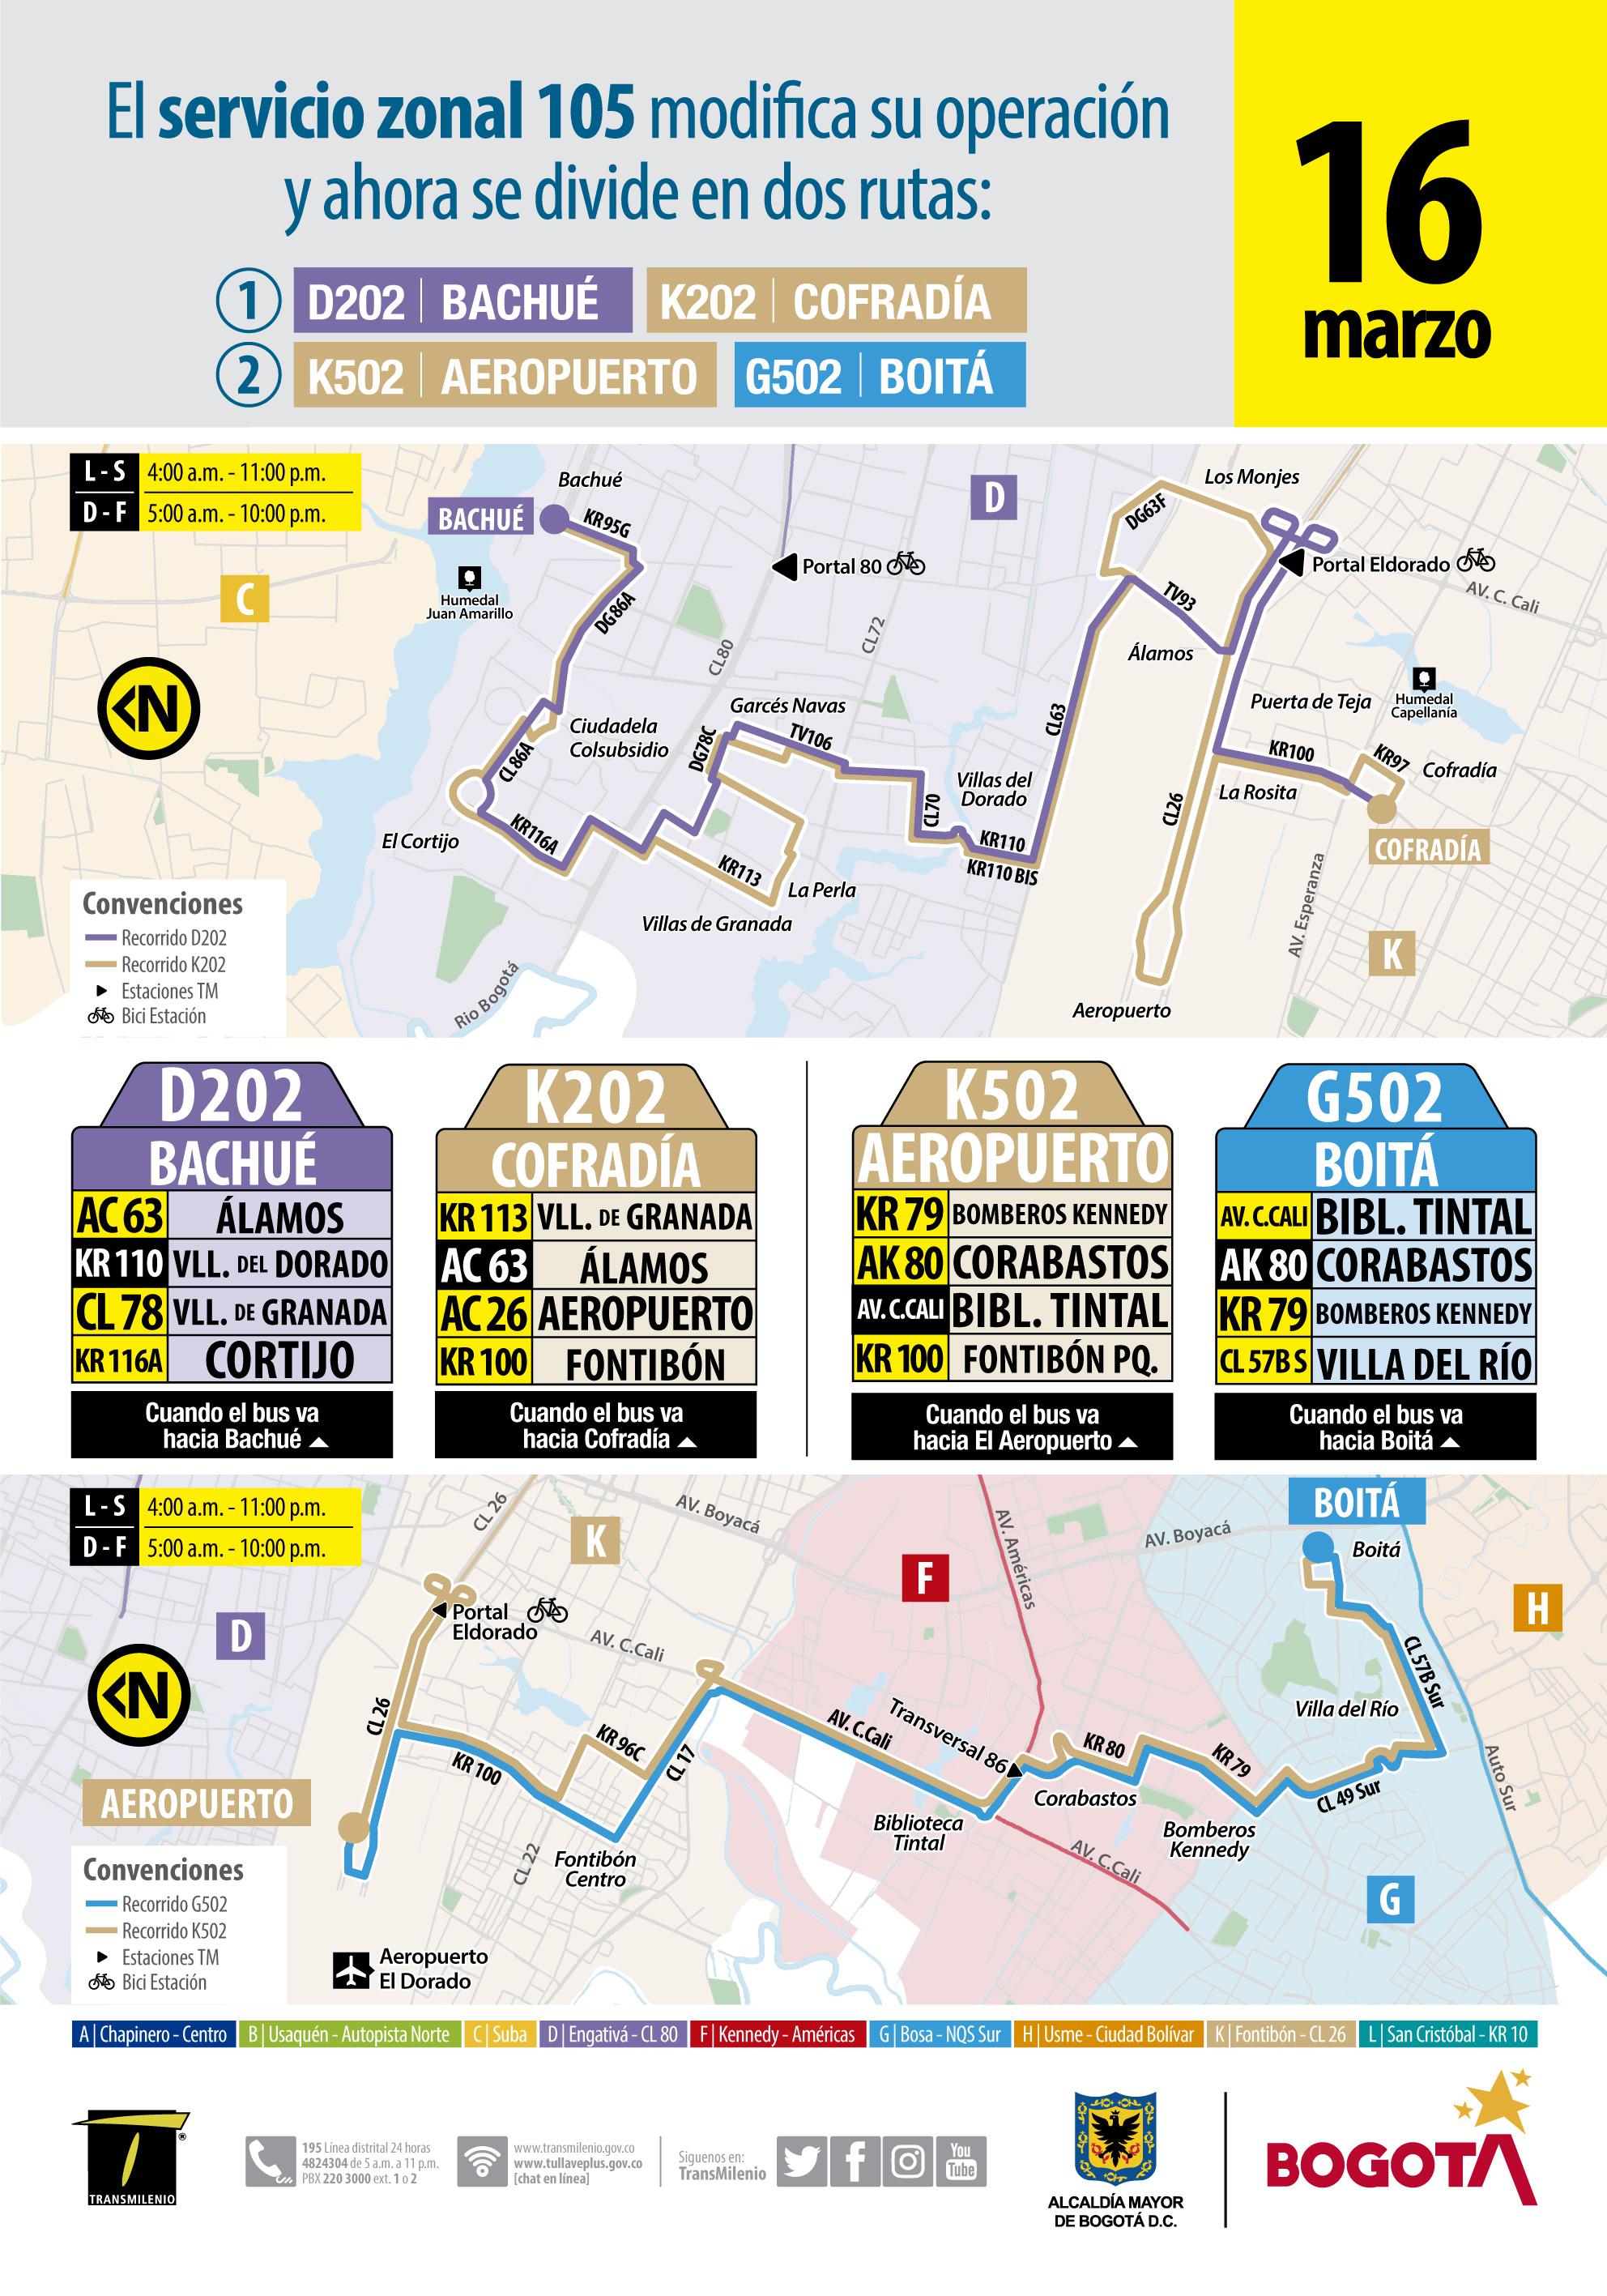 Alternativas para la ruta C52